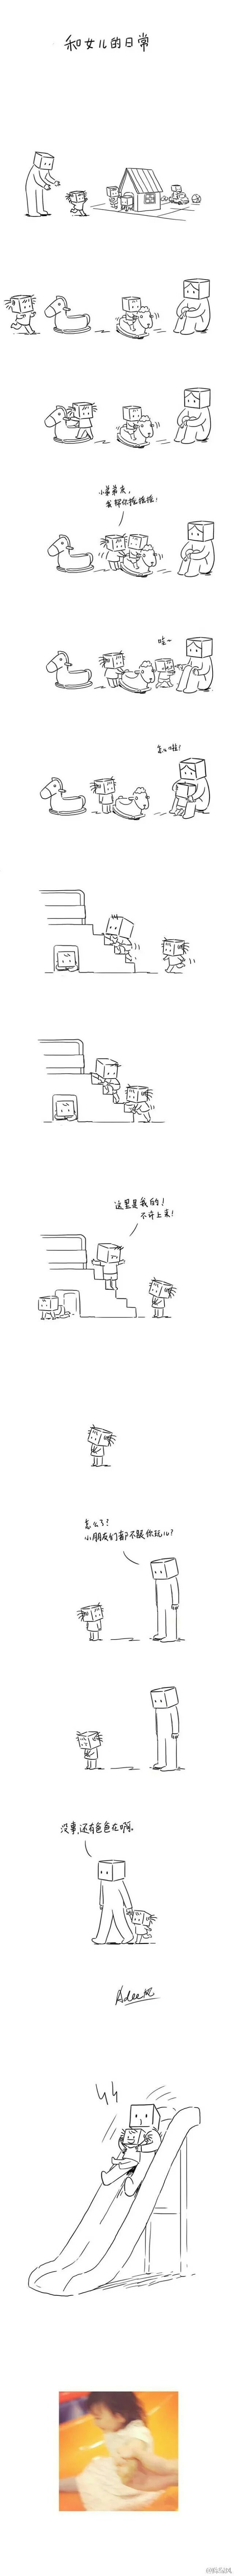 d0091476679899 - 温馨漫画-《和女儿的日常》